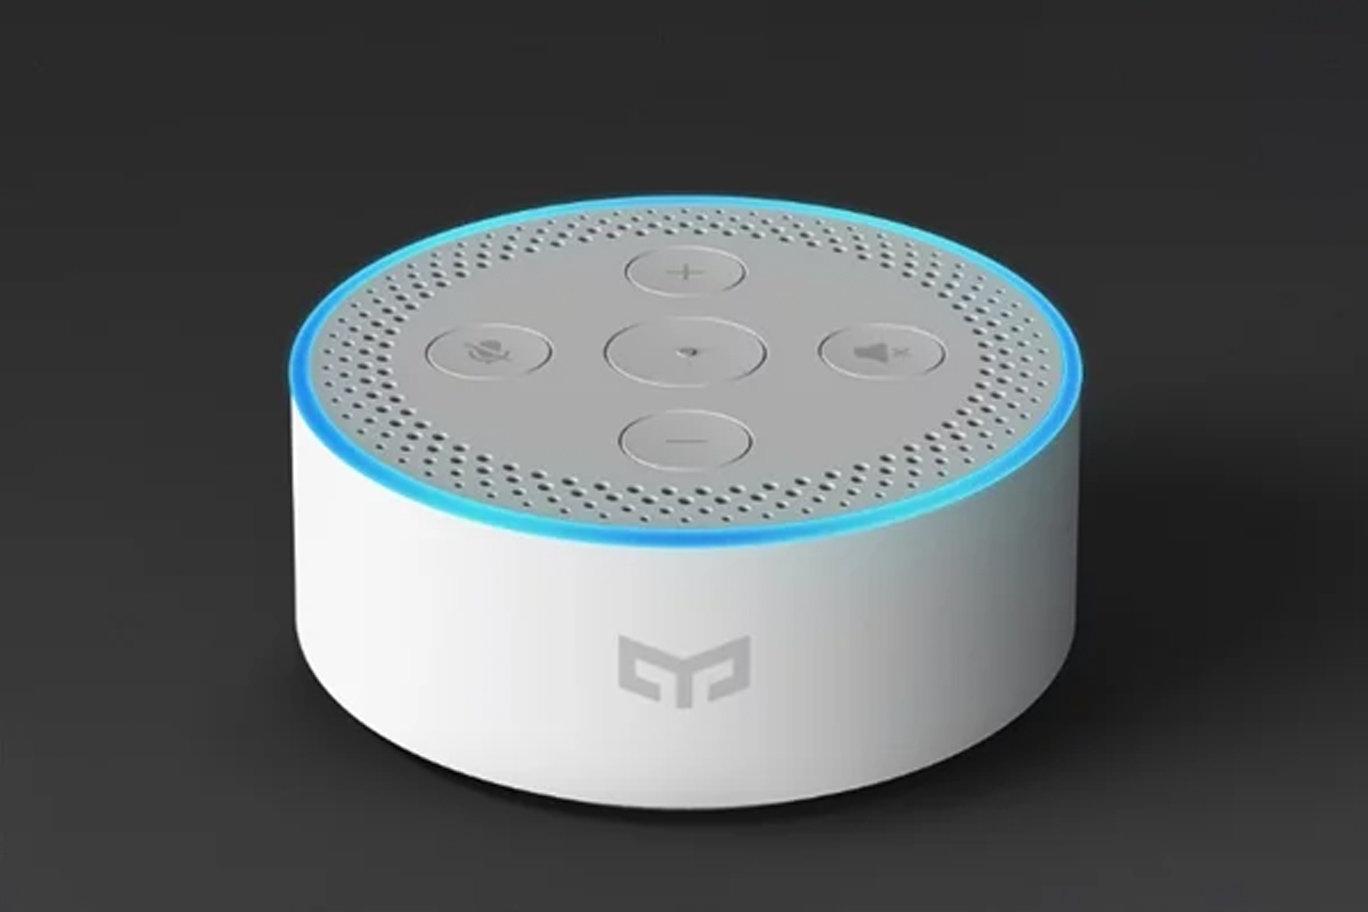 Yeelight-Smart-Speaker